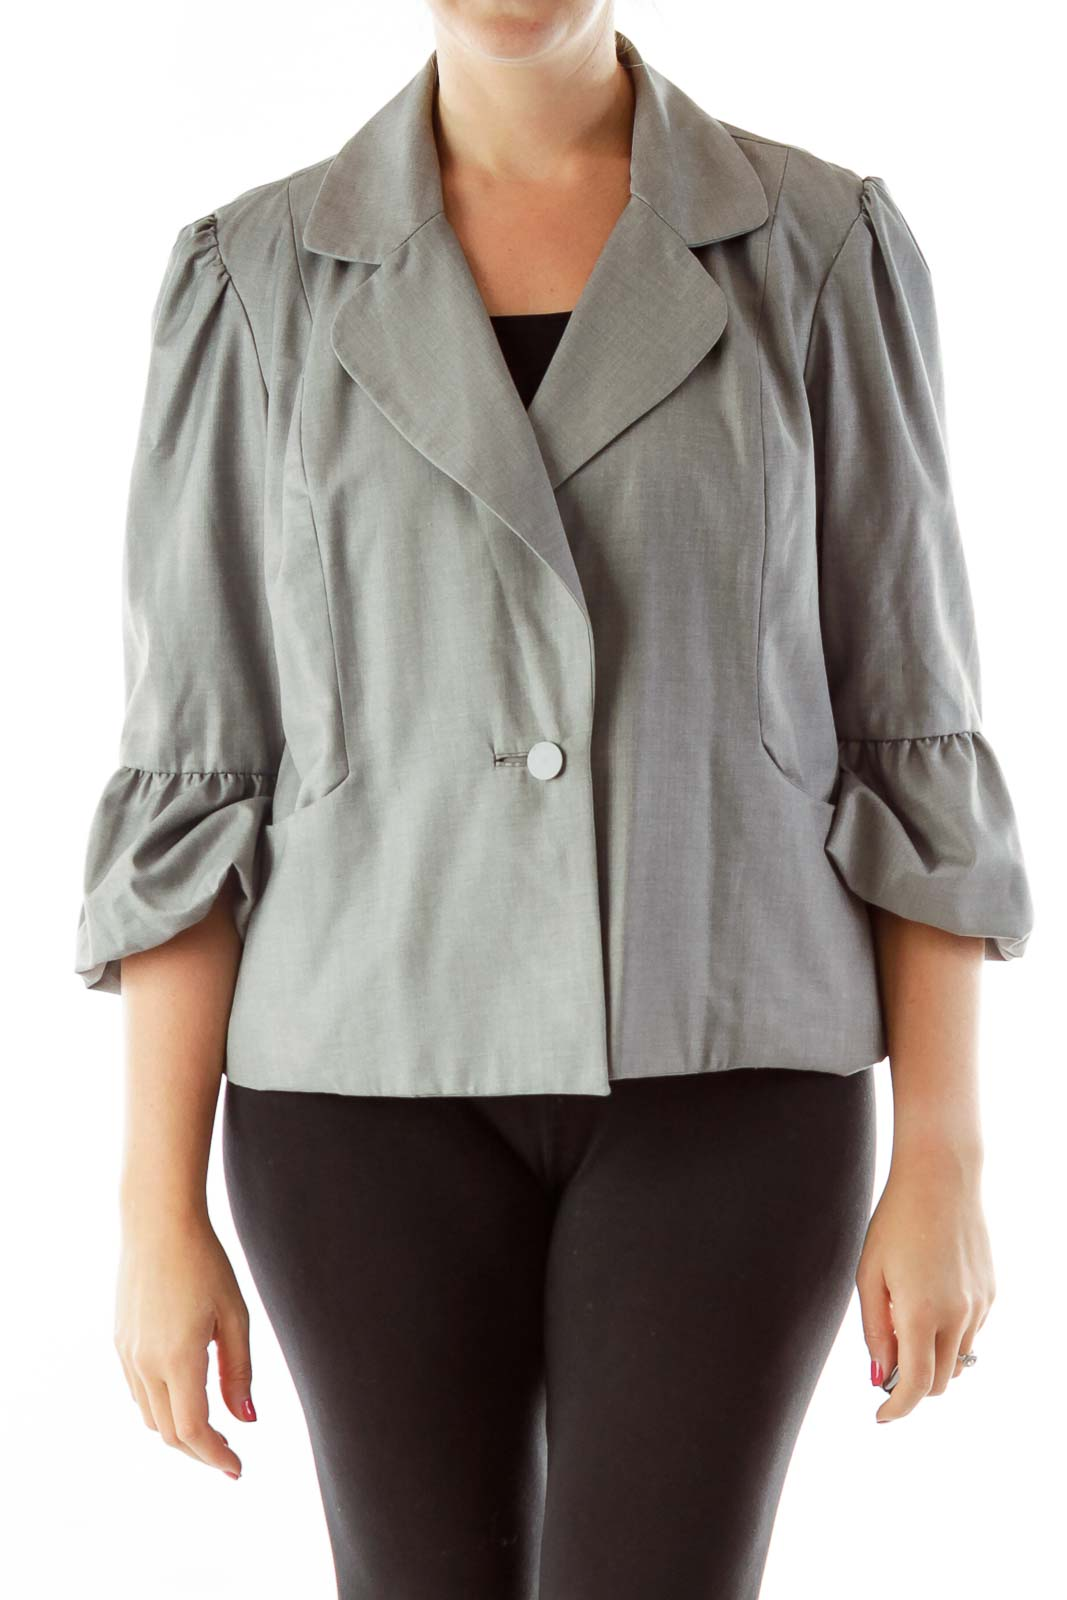 Gray Puffy Sleeves Blazer